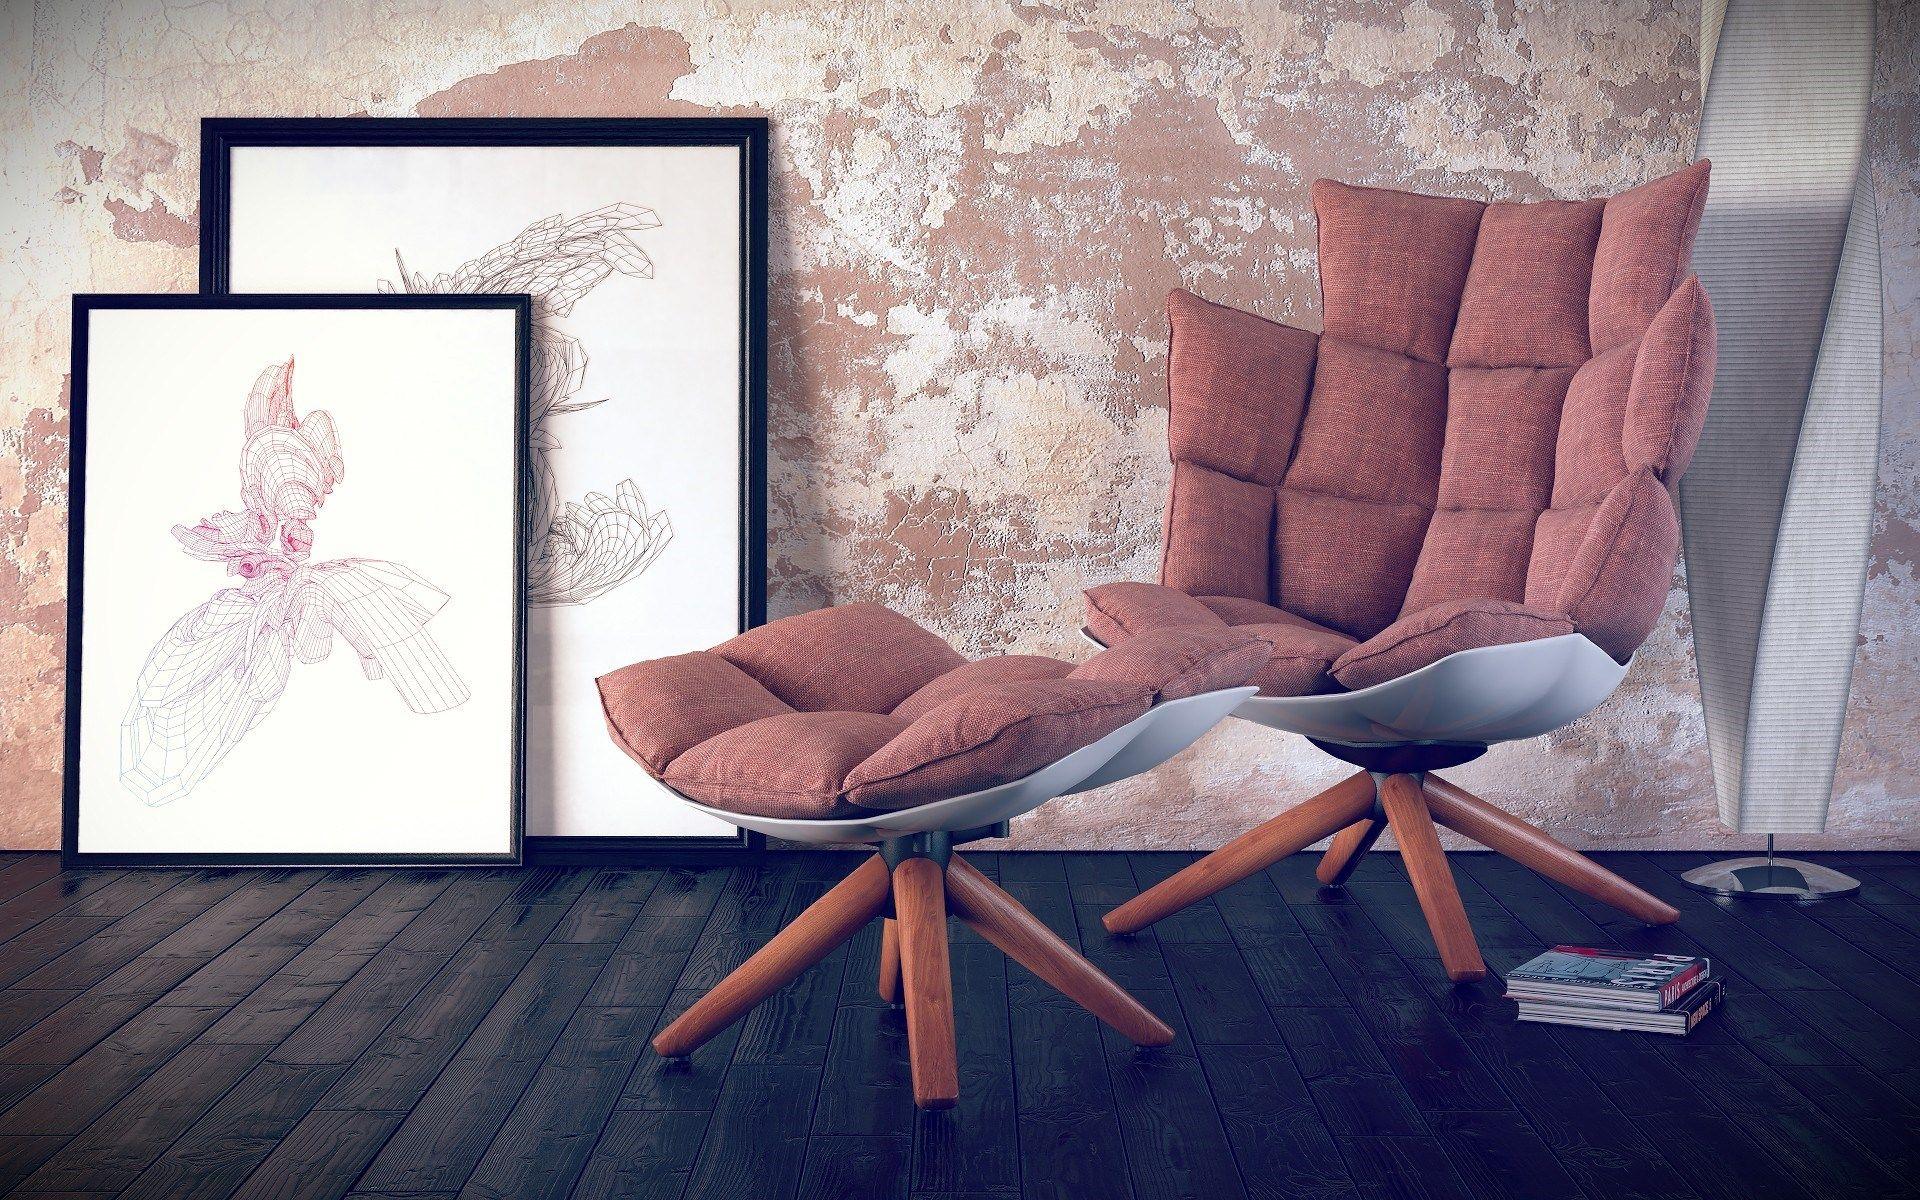 chair pillows lamp floor books paintings